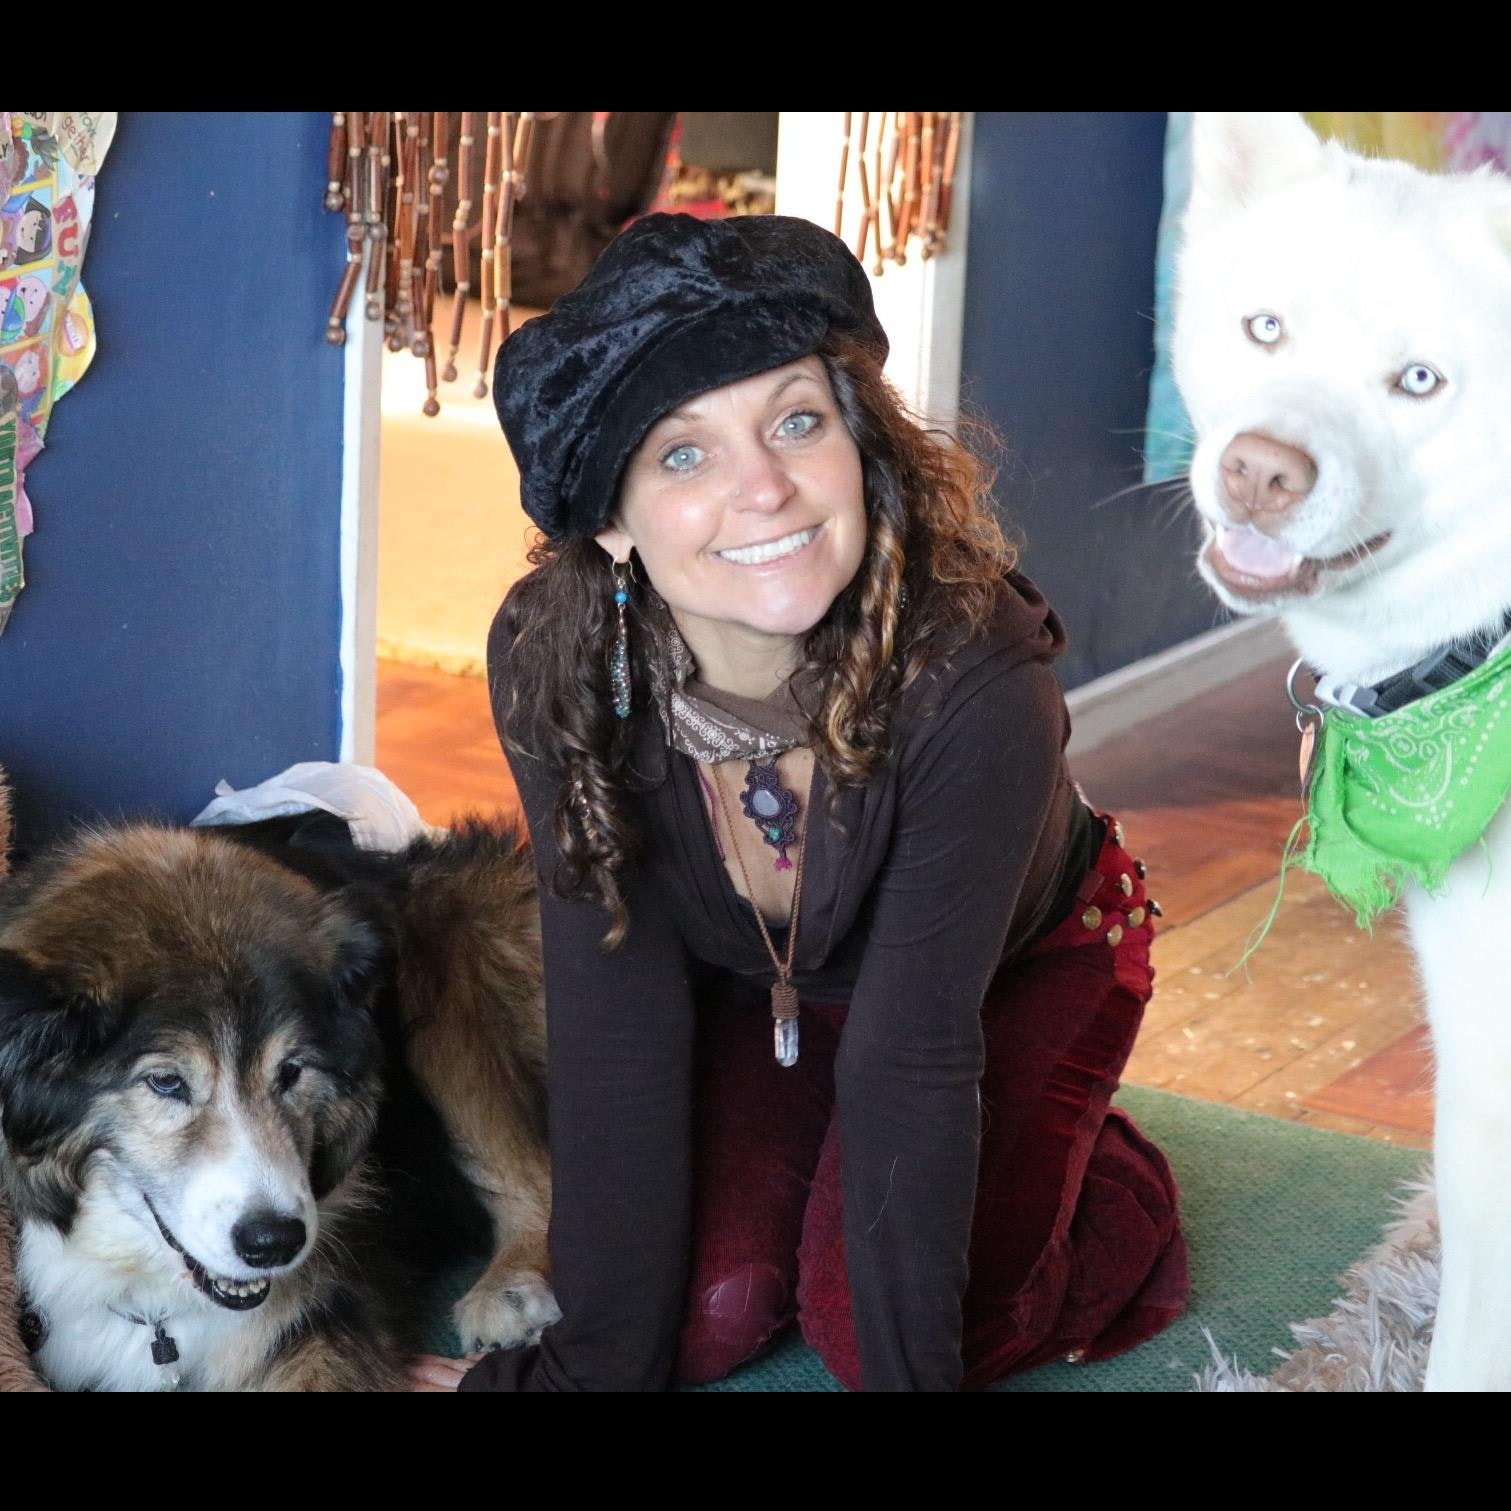 MeghantheKat's dog day care